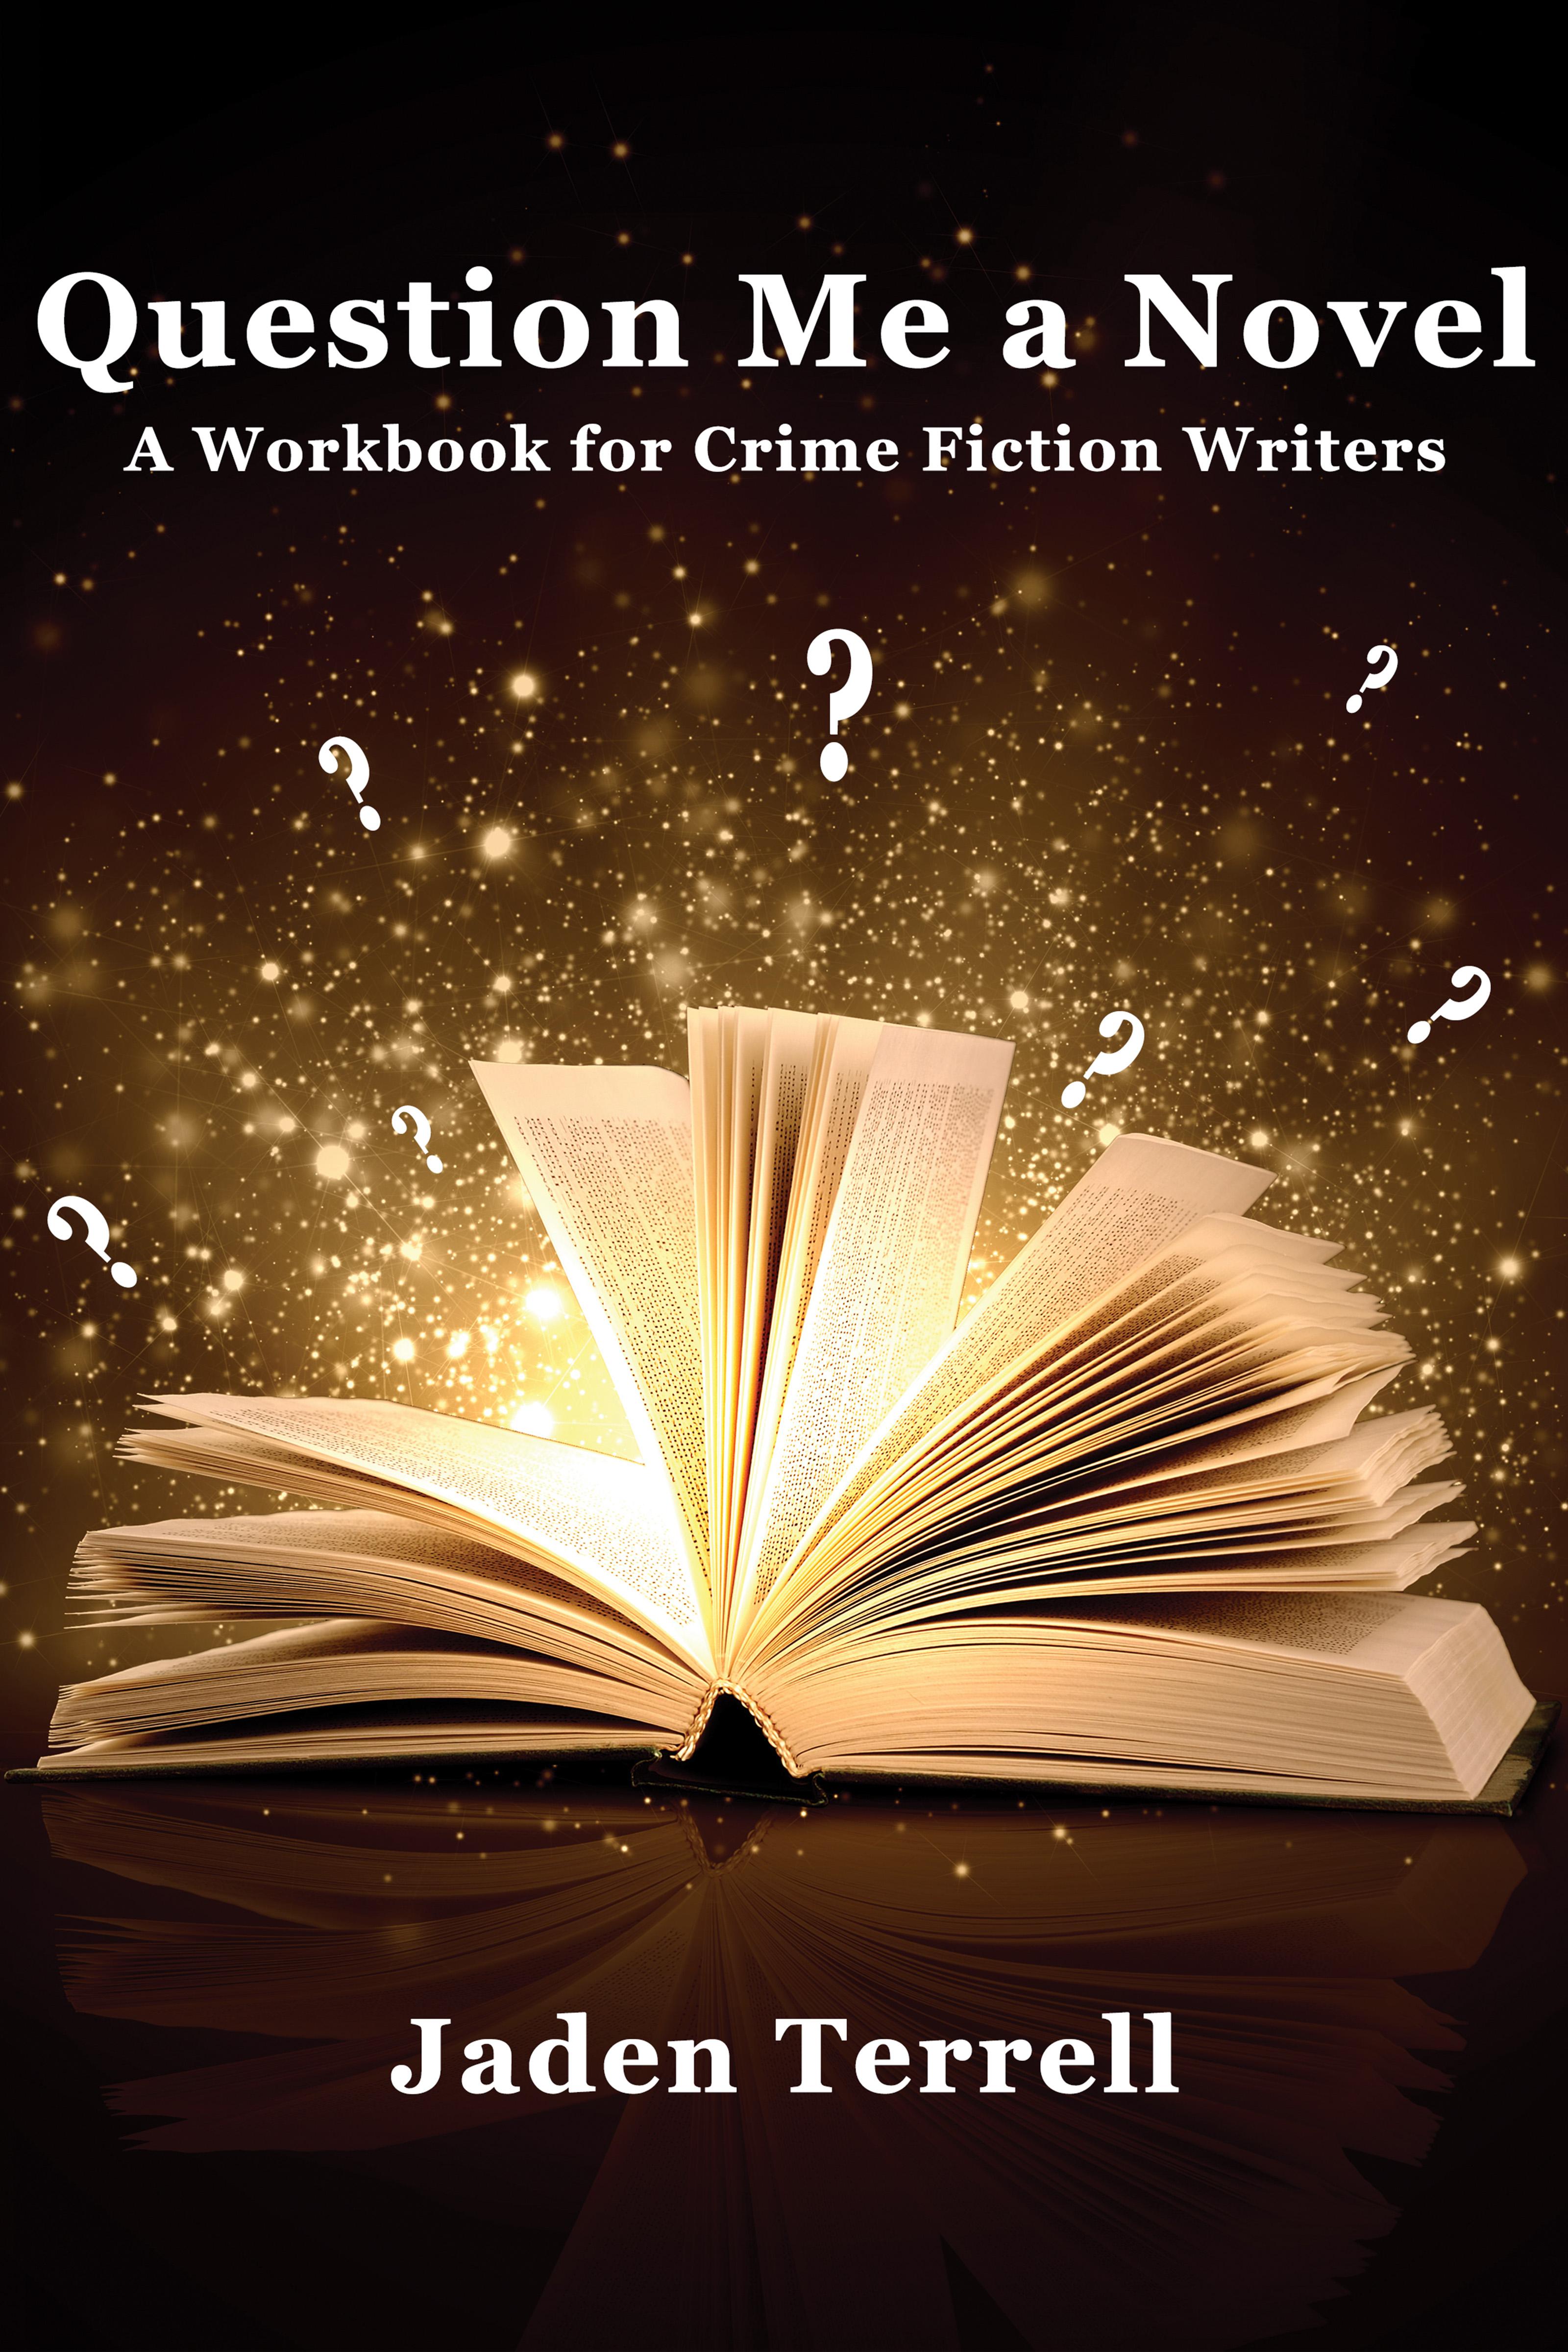 Novel-Writing Workshop | Jaden Terrell